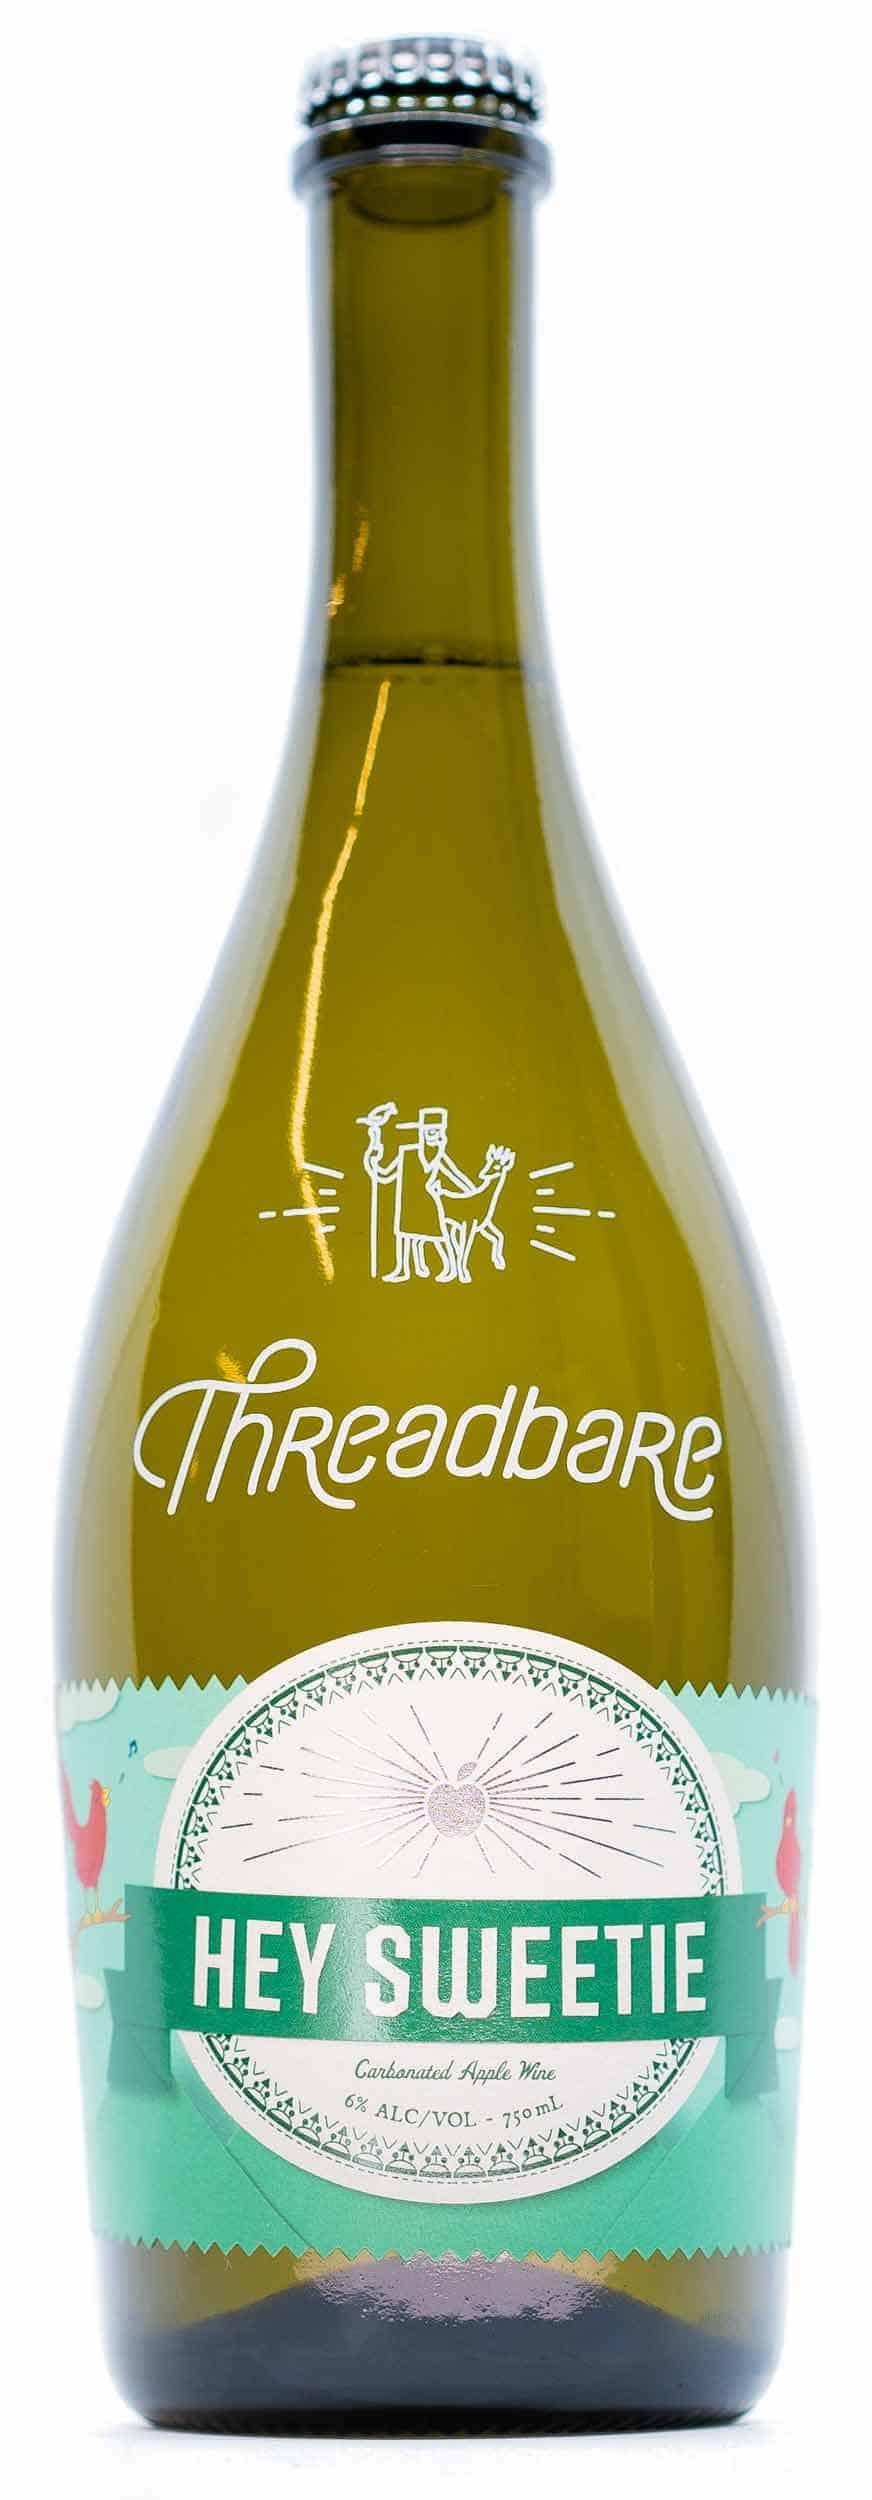 Threadbare Cider House Hey Sweetie Cider Bottle